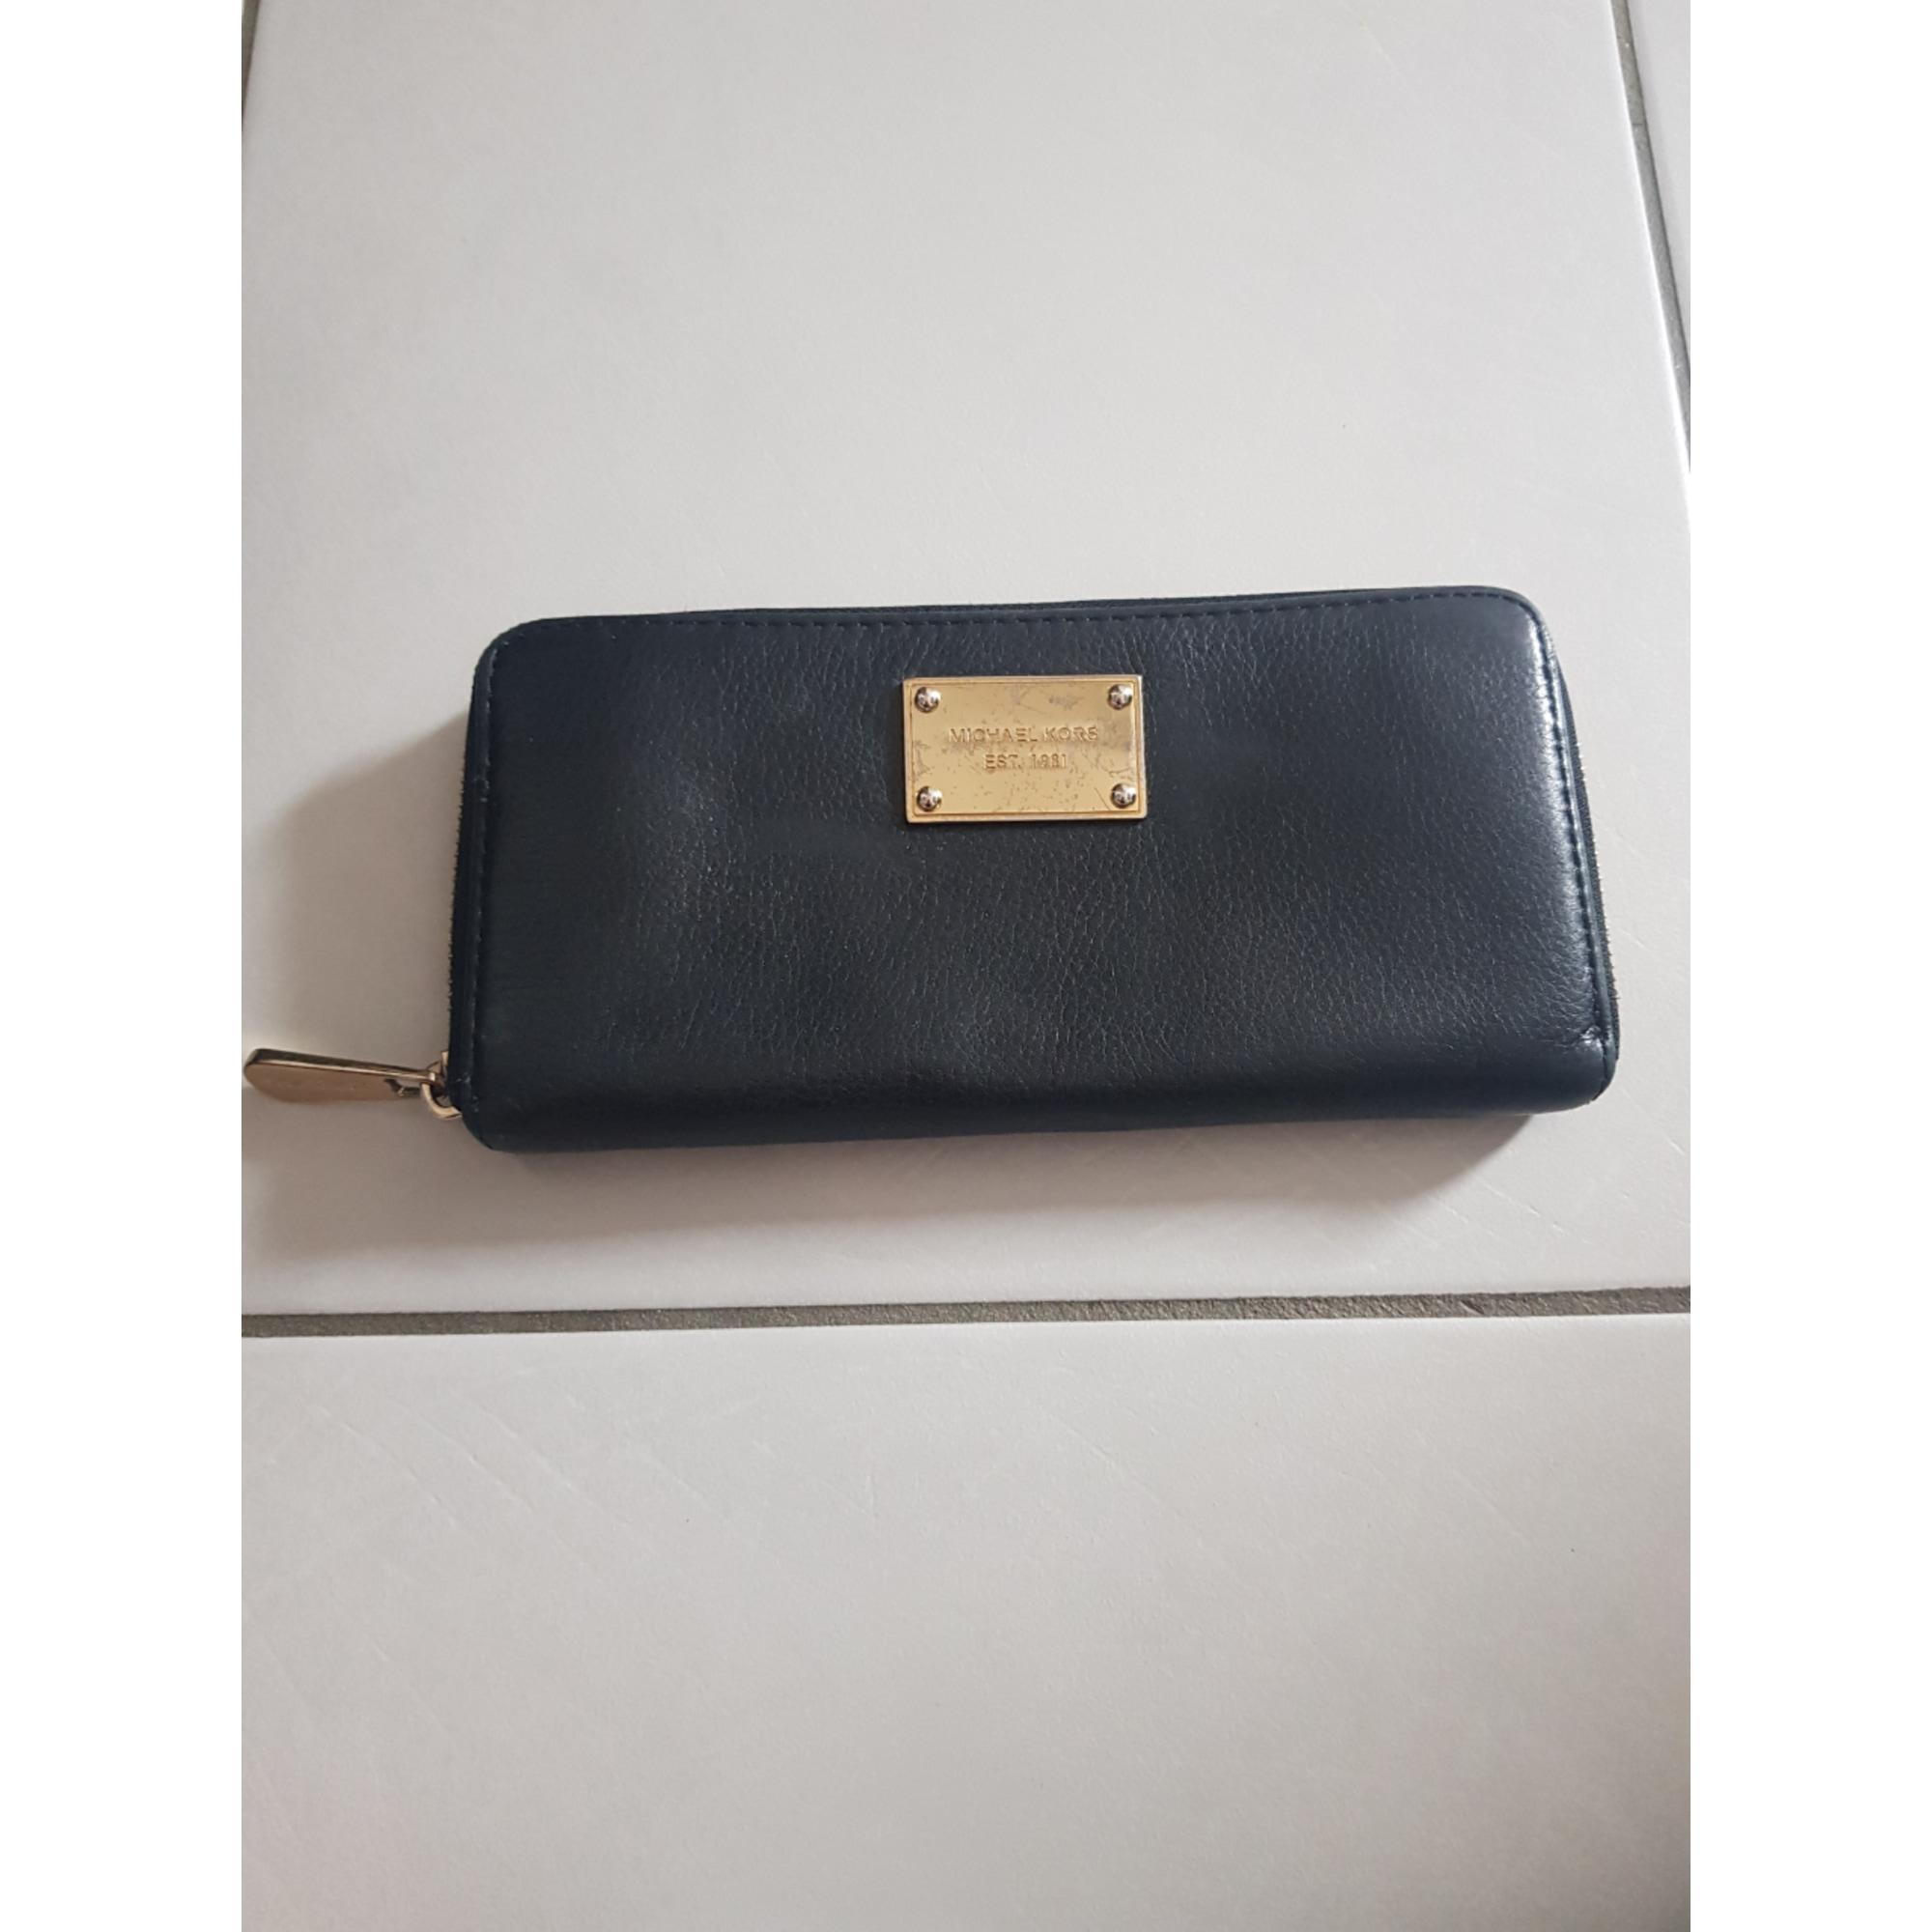 Wallet MICHAEL KORS Black